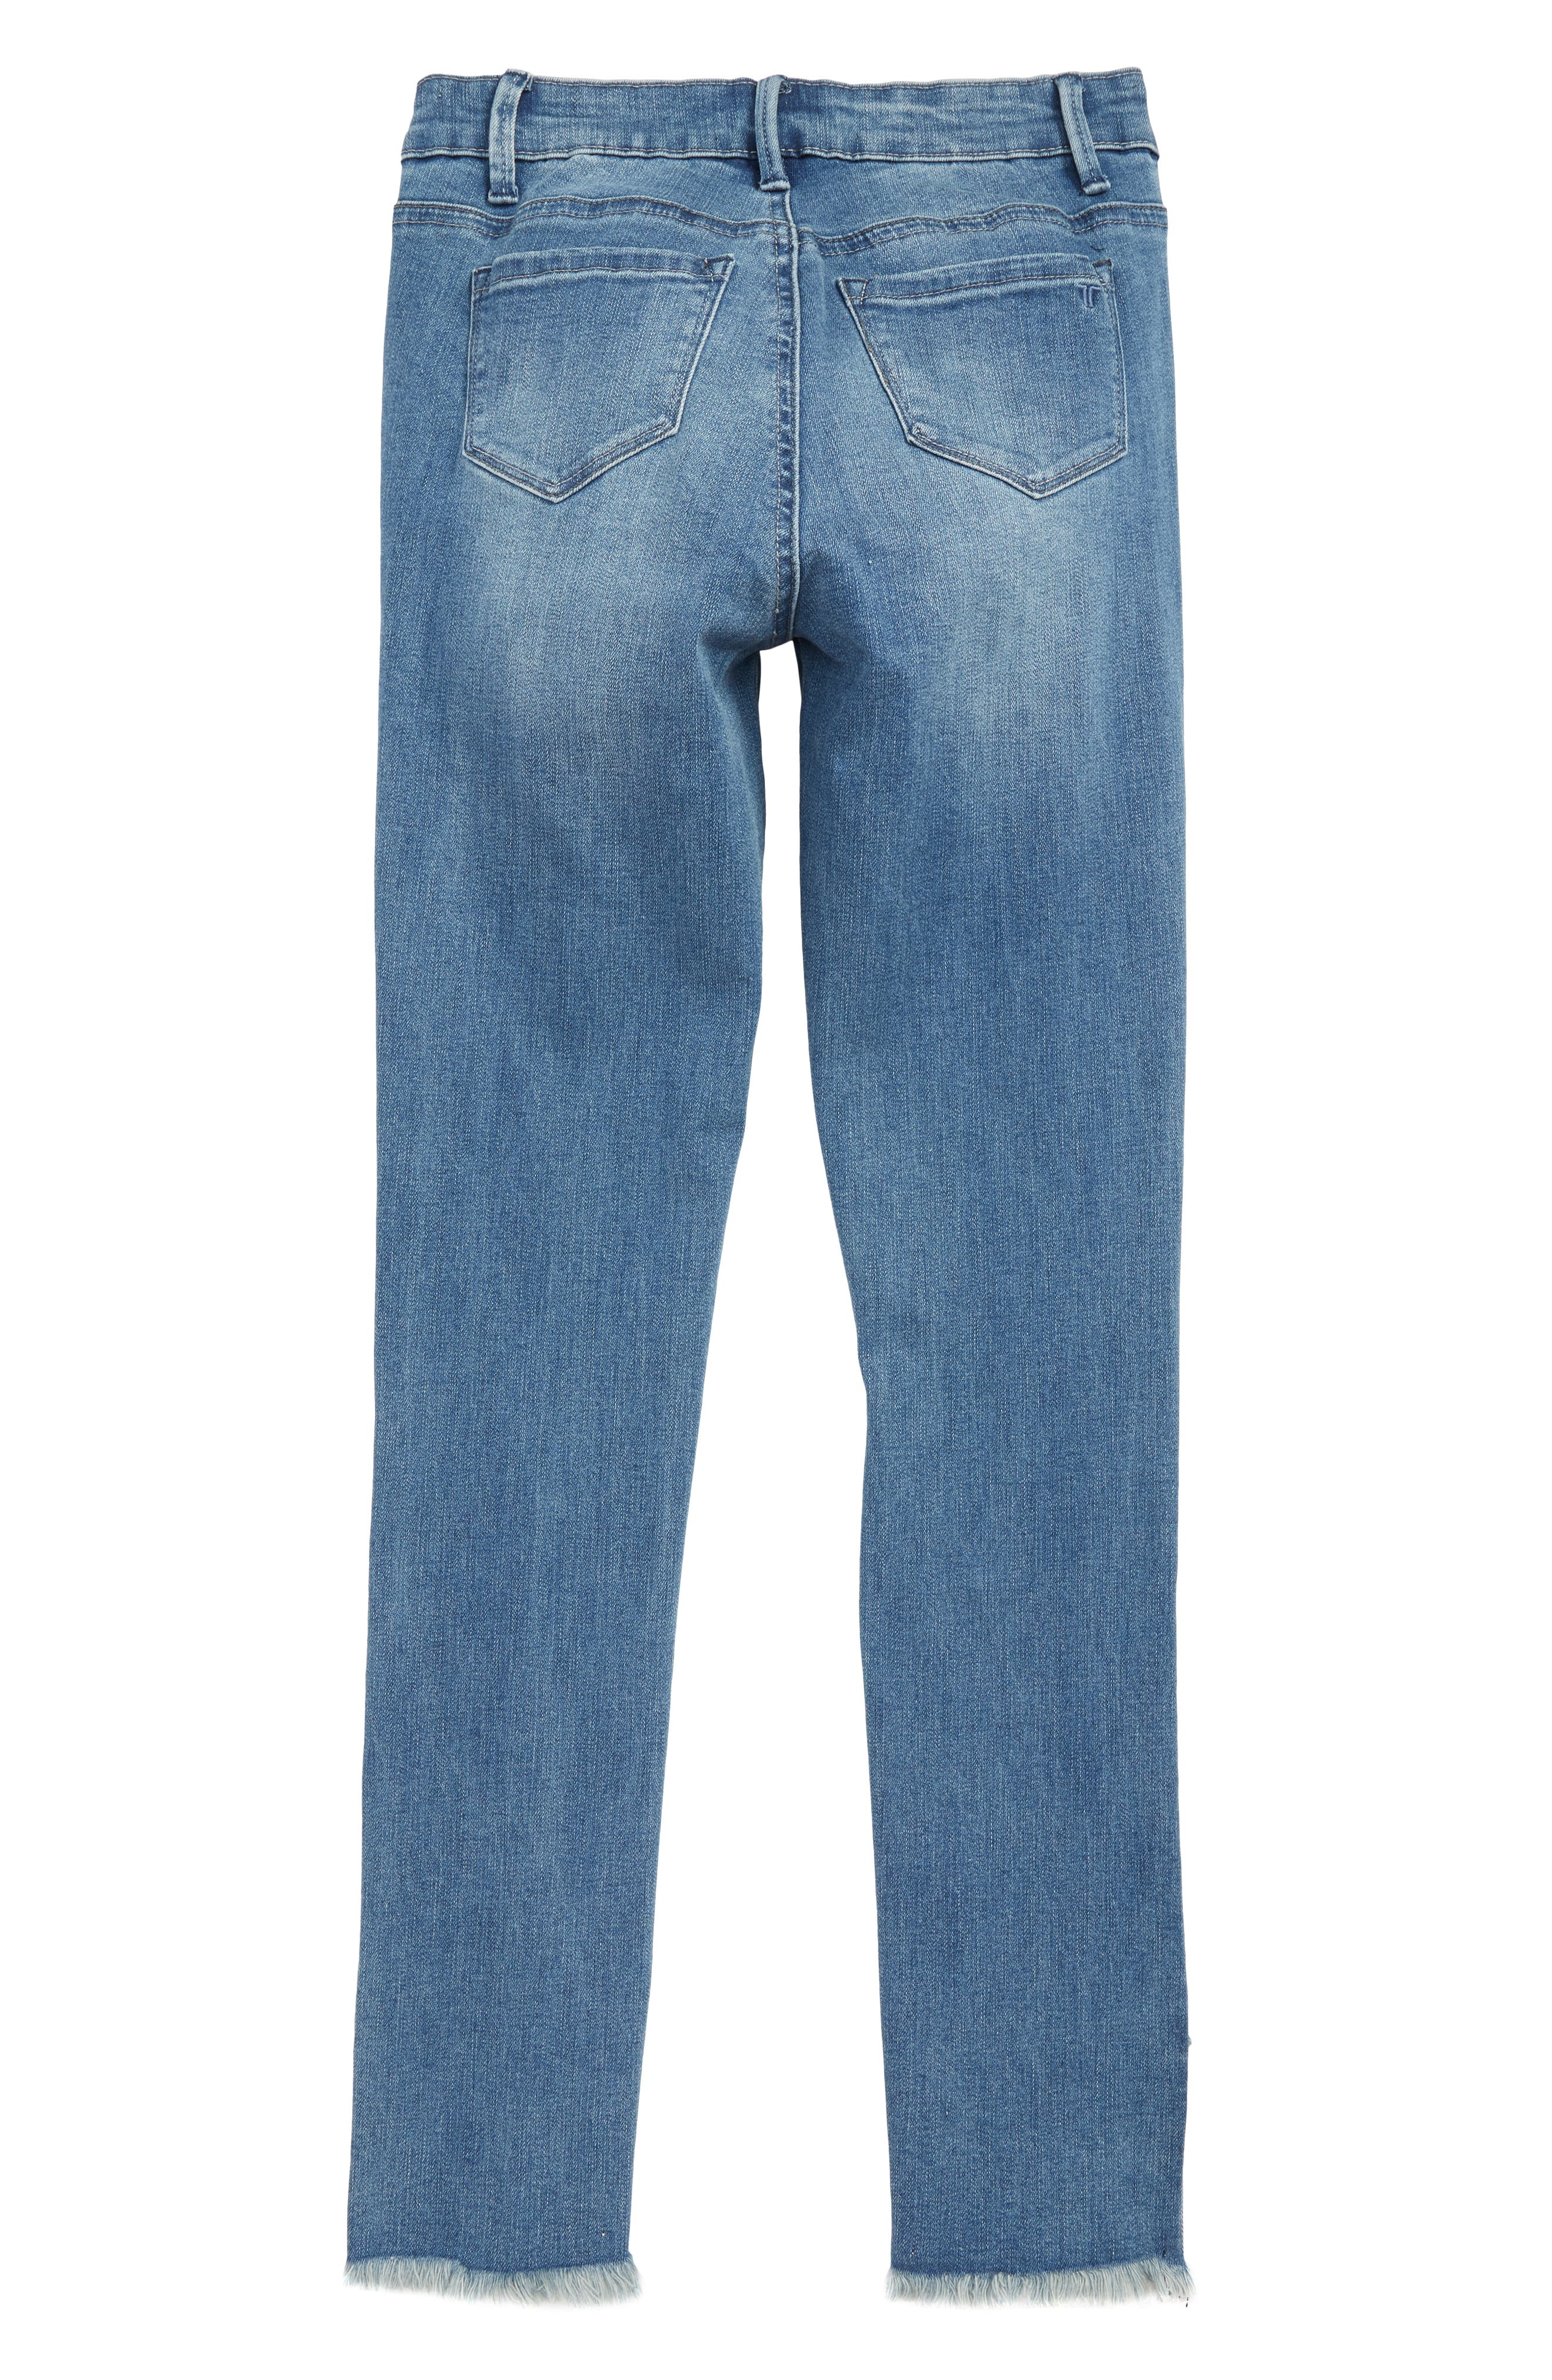 TRACTR,                             Deconstructed Eyelet Hem Skinny Jeans,                             Alternate thumbnail 2, color,                             407